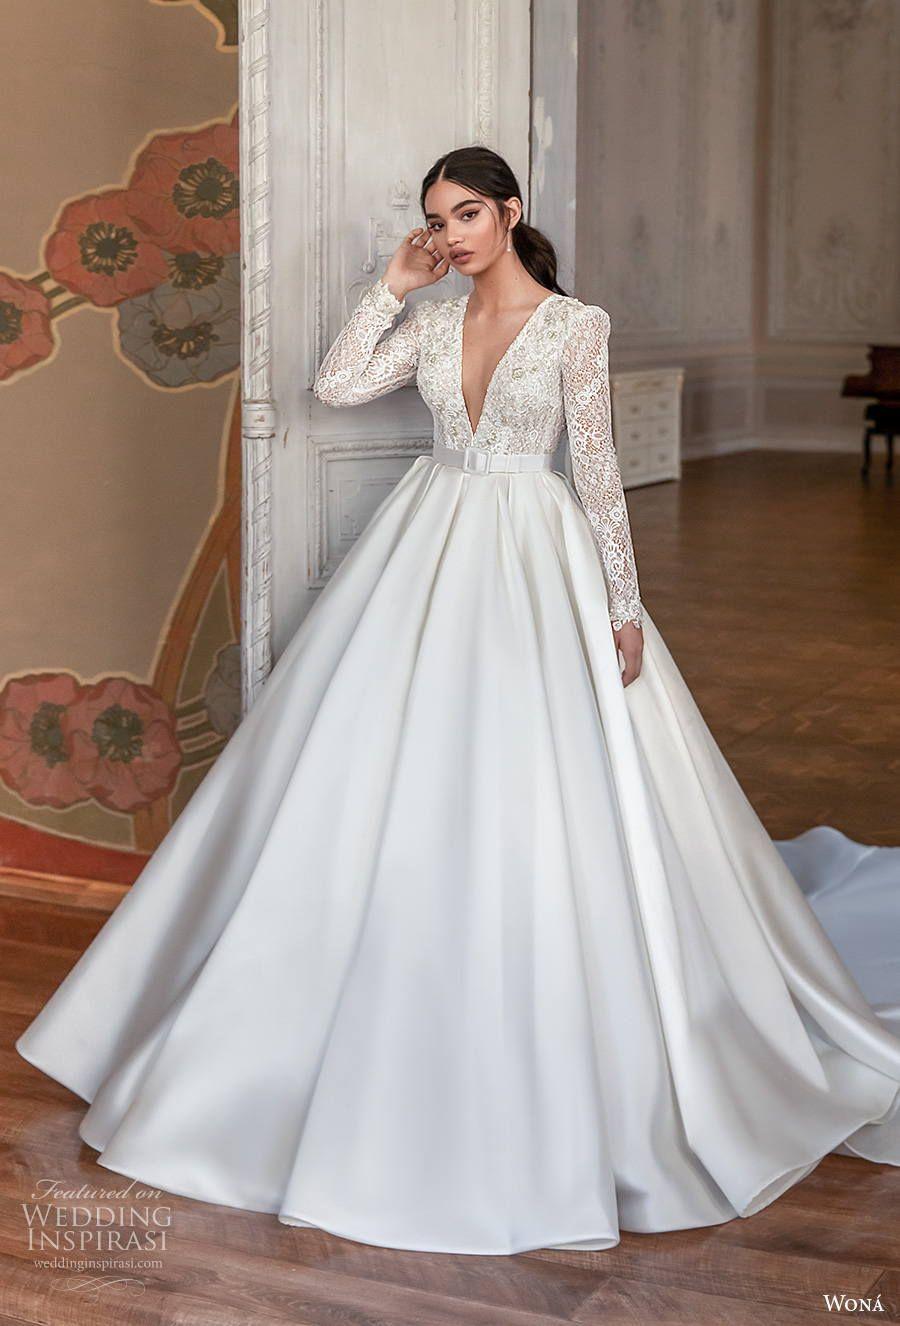 Wona Concept 2021 Romance Wedding Dresses Wedding Inspirasi Wedding Dresses Queen Wedding Dress Romance Wedding Dress [ 1326 x 900 Pixel ]